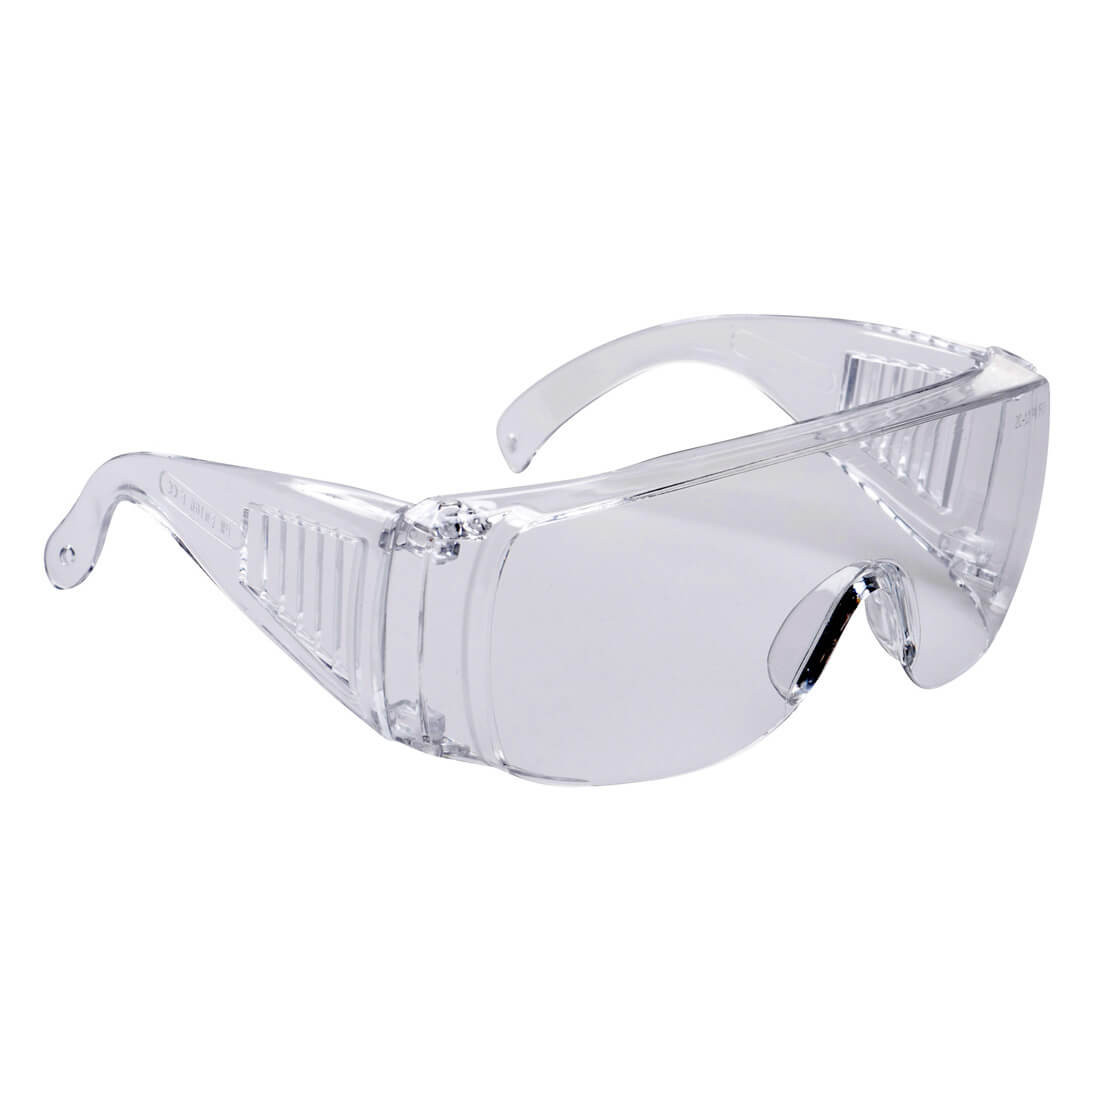 Ochelari de Protectie Vizitator - Echipamente de protectie personala